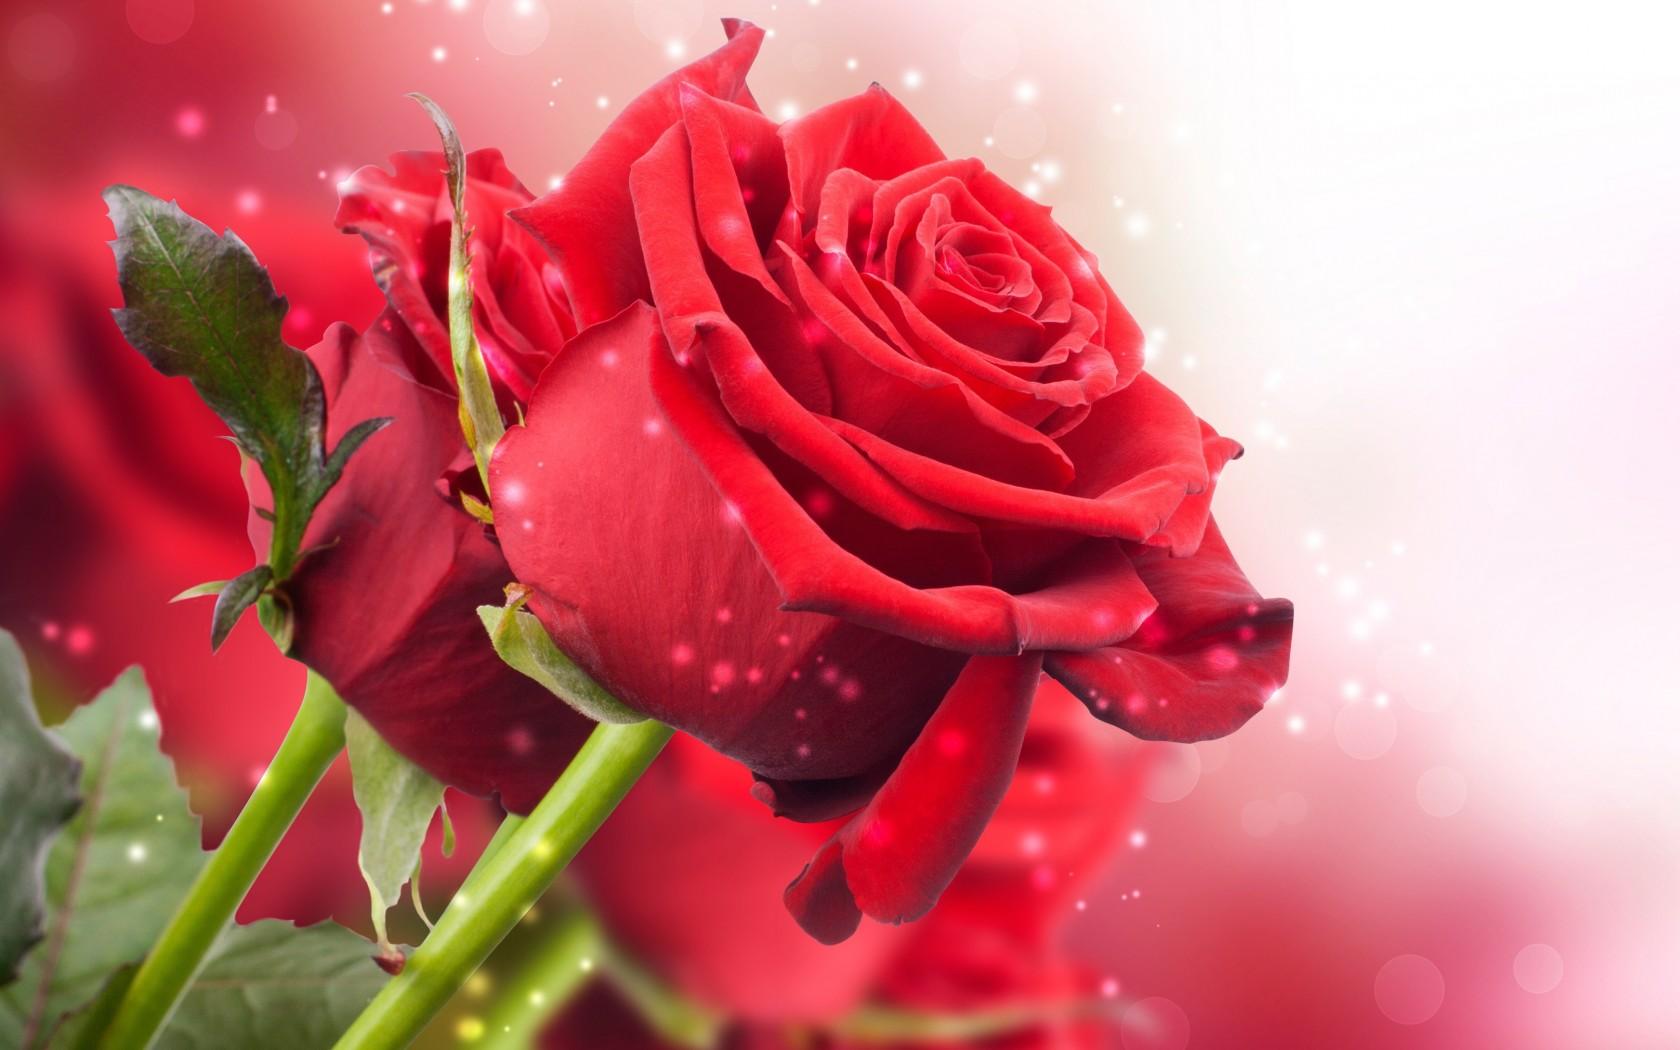 ảnh nền hoa hồng iphone